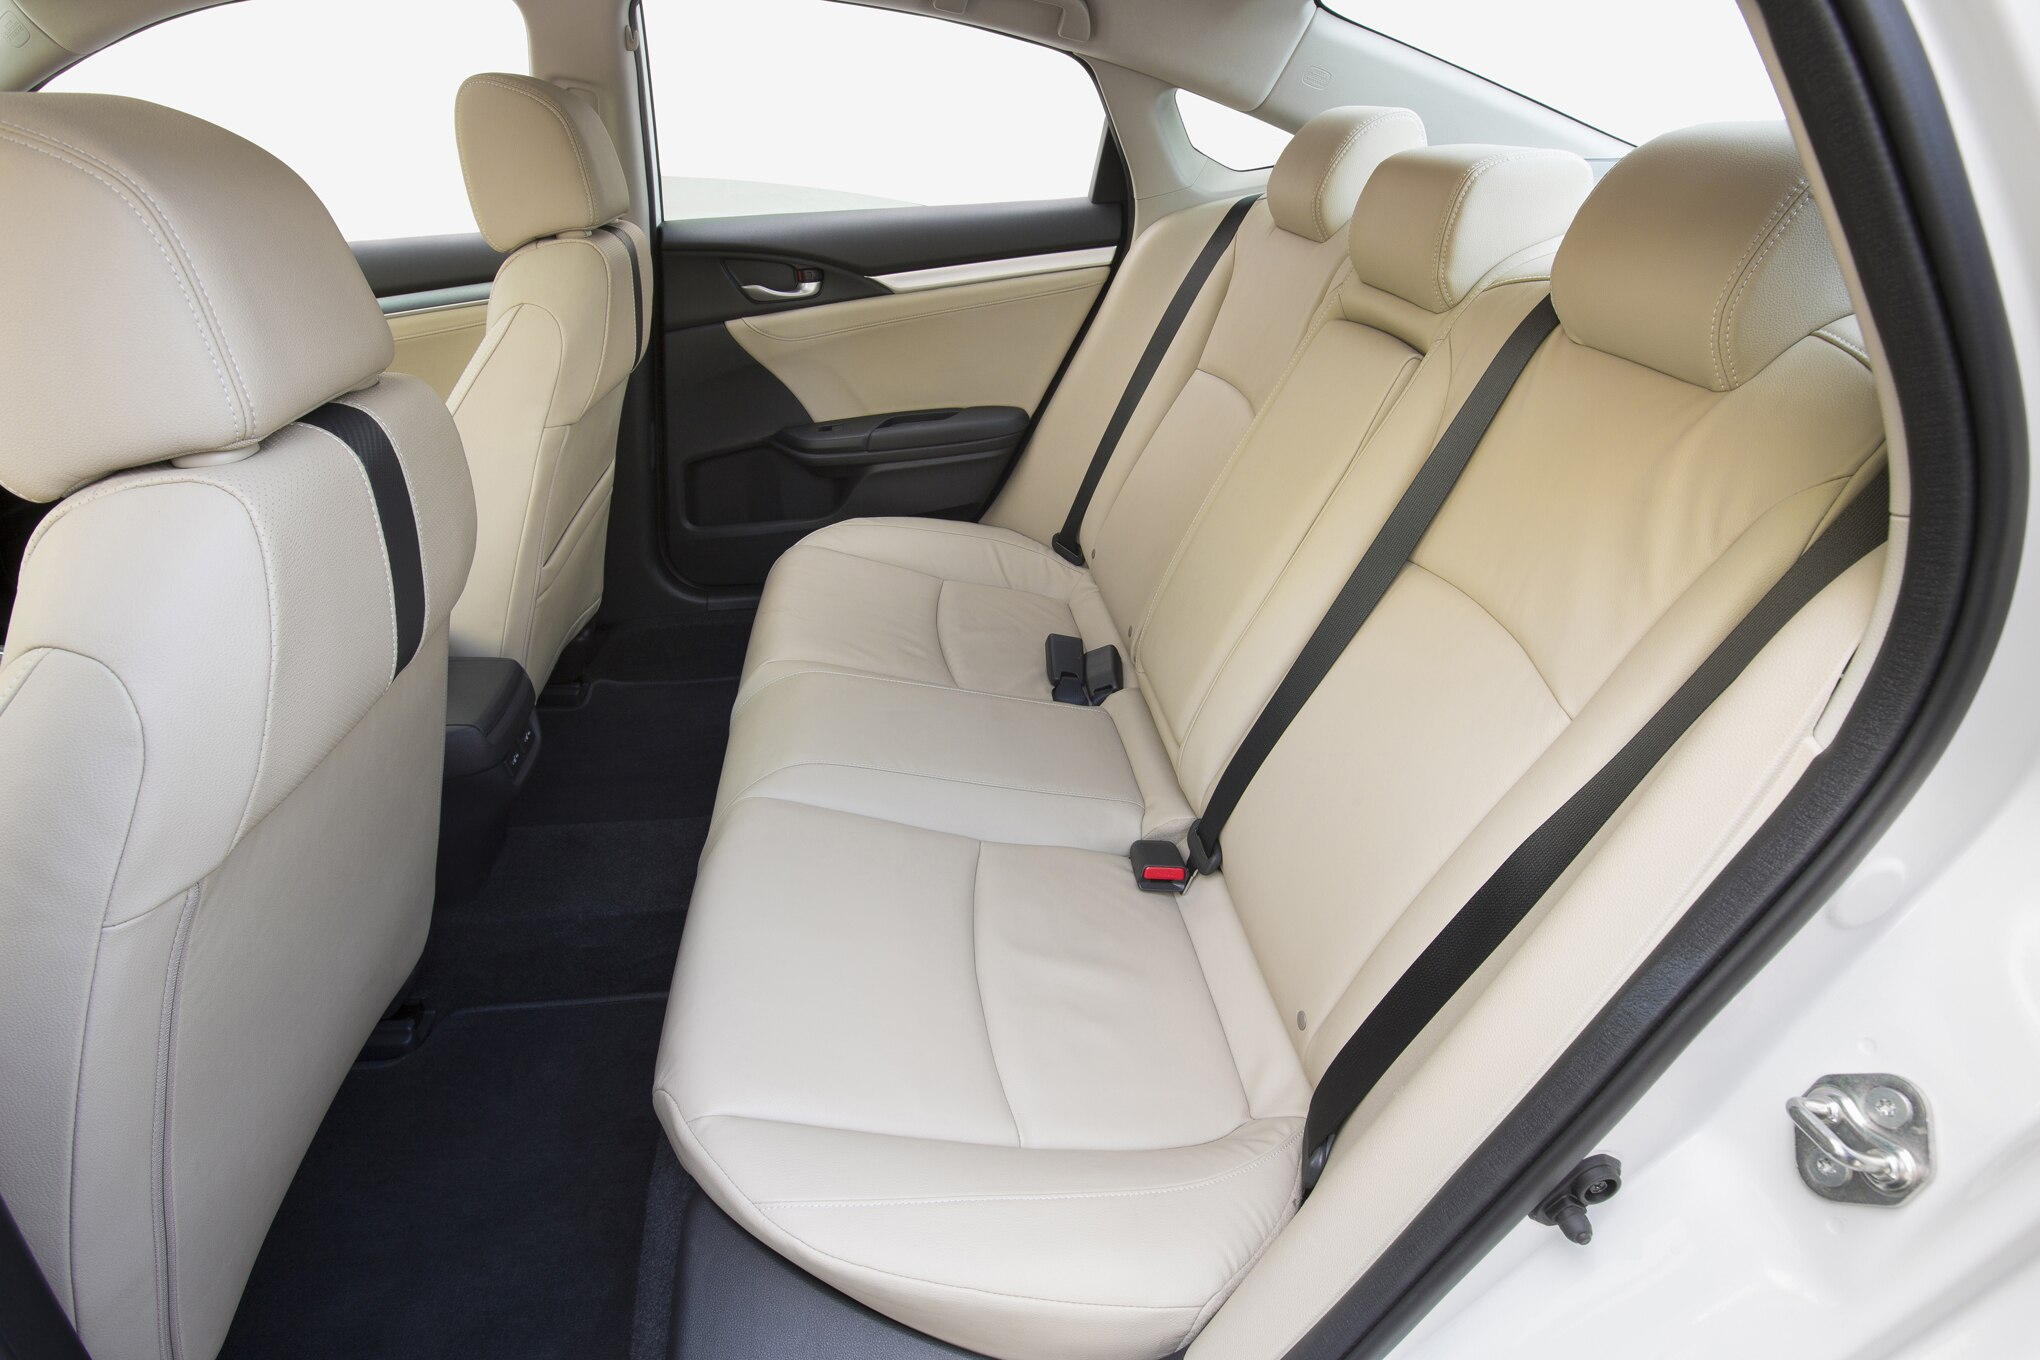 10th Generation Civic Exclusive Pakistan Launch - 2016 Honda Civic Touring rear interior seats